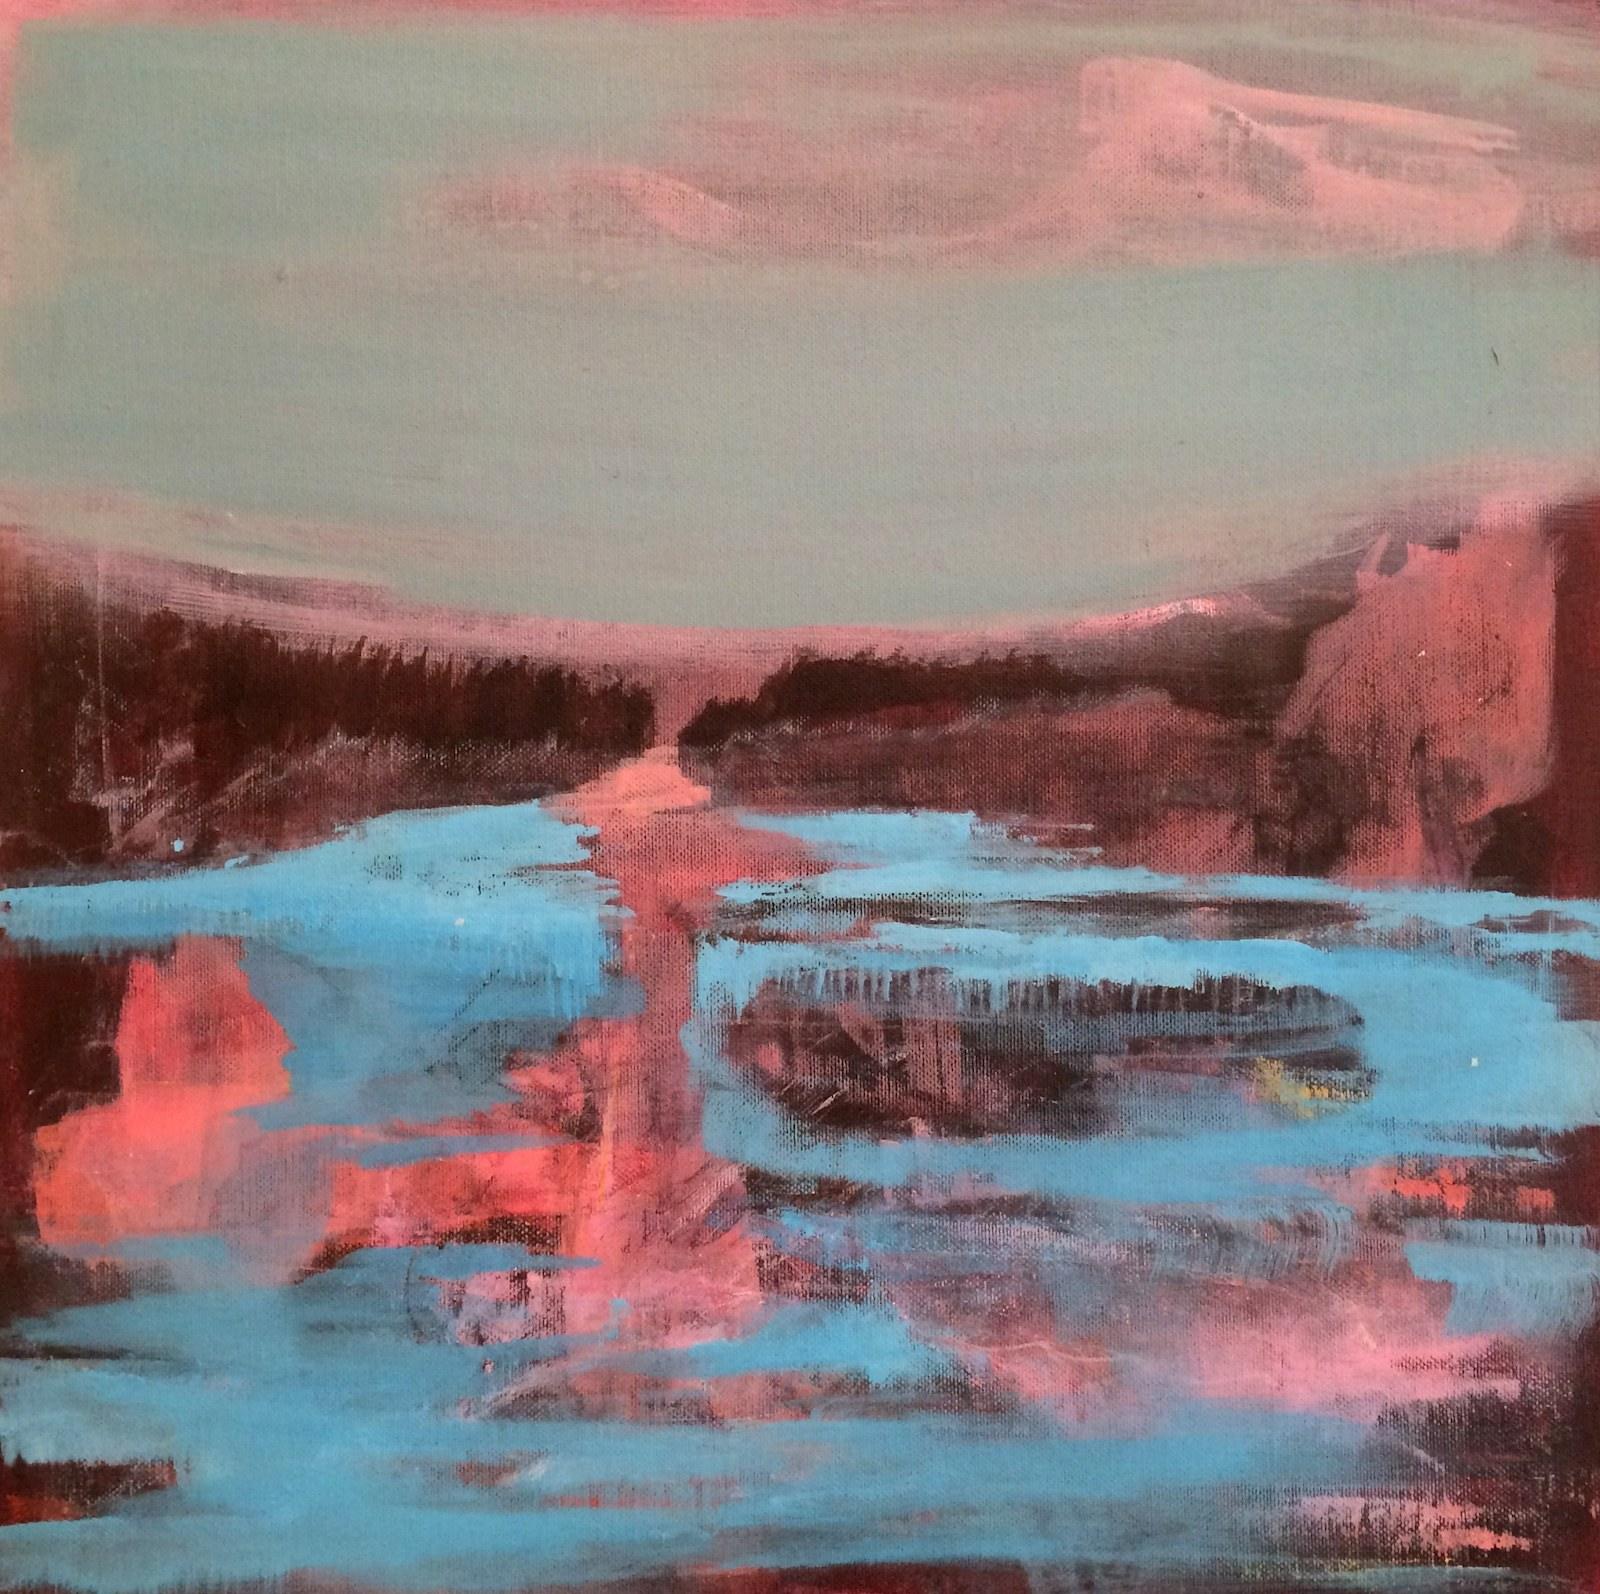 icy valley, 40 x 40 cm, 2016, Jane Hughes